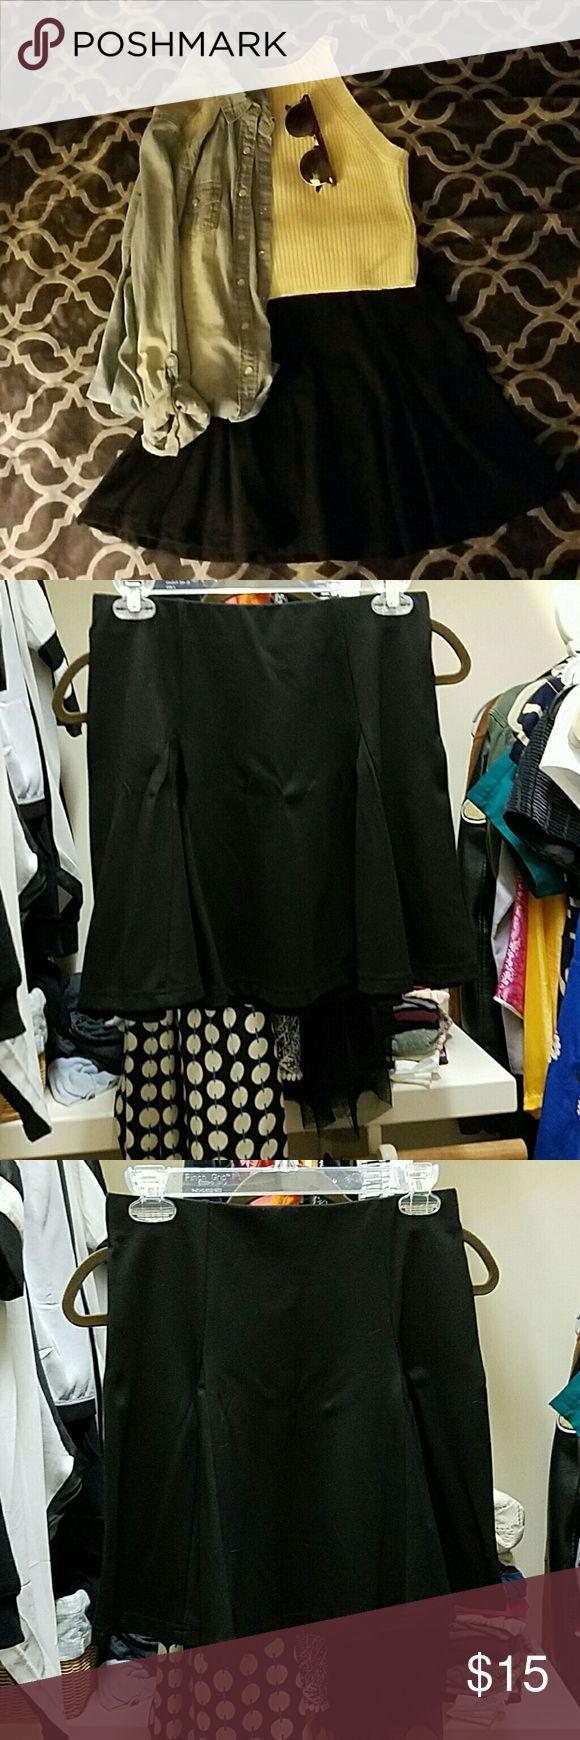 Black Circle Skirt Worn once  Good for formal attire  Comfortable Forever 21 Skirts Midi